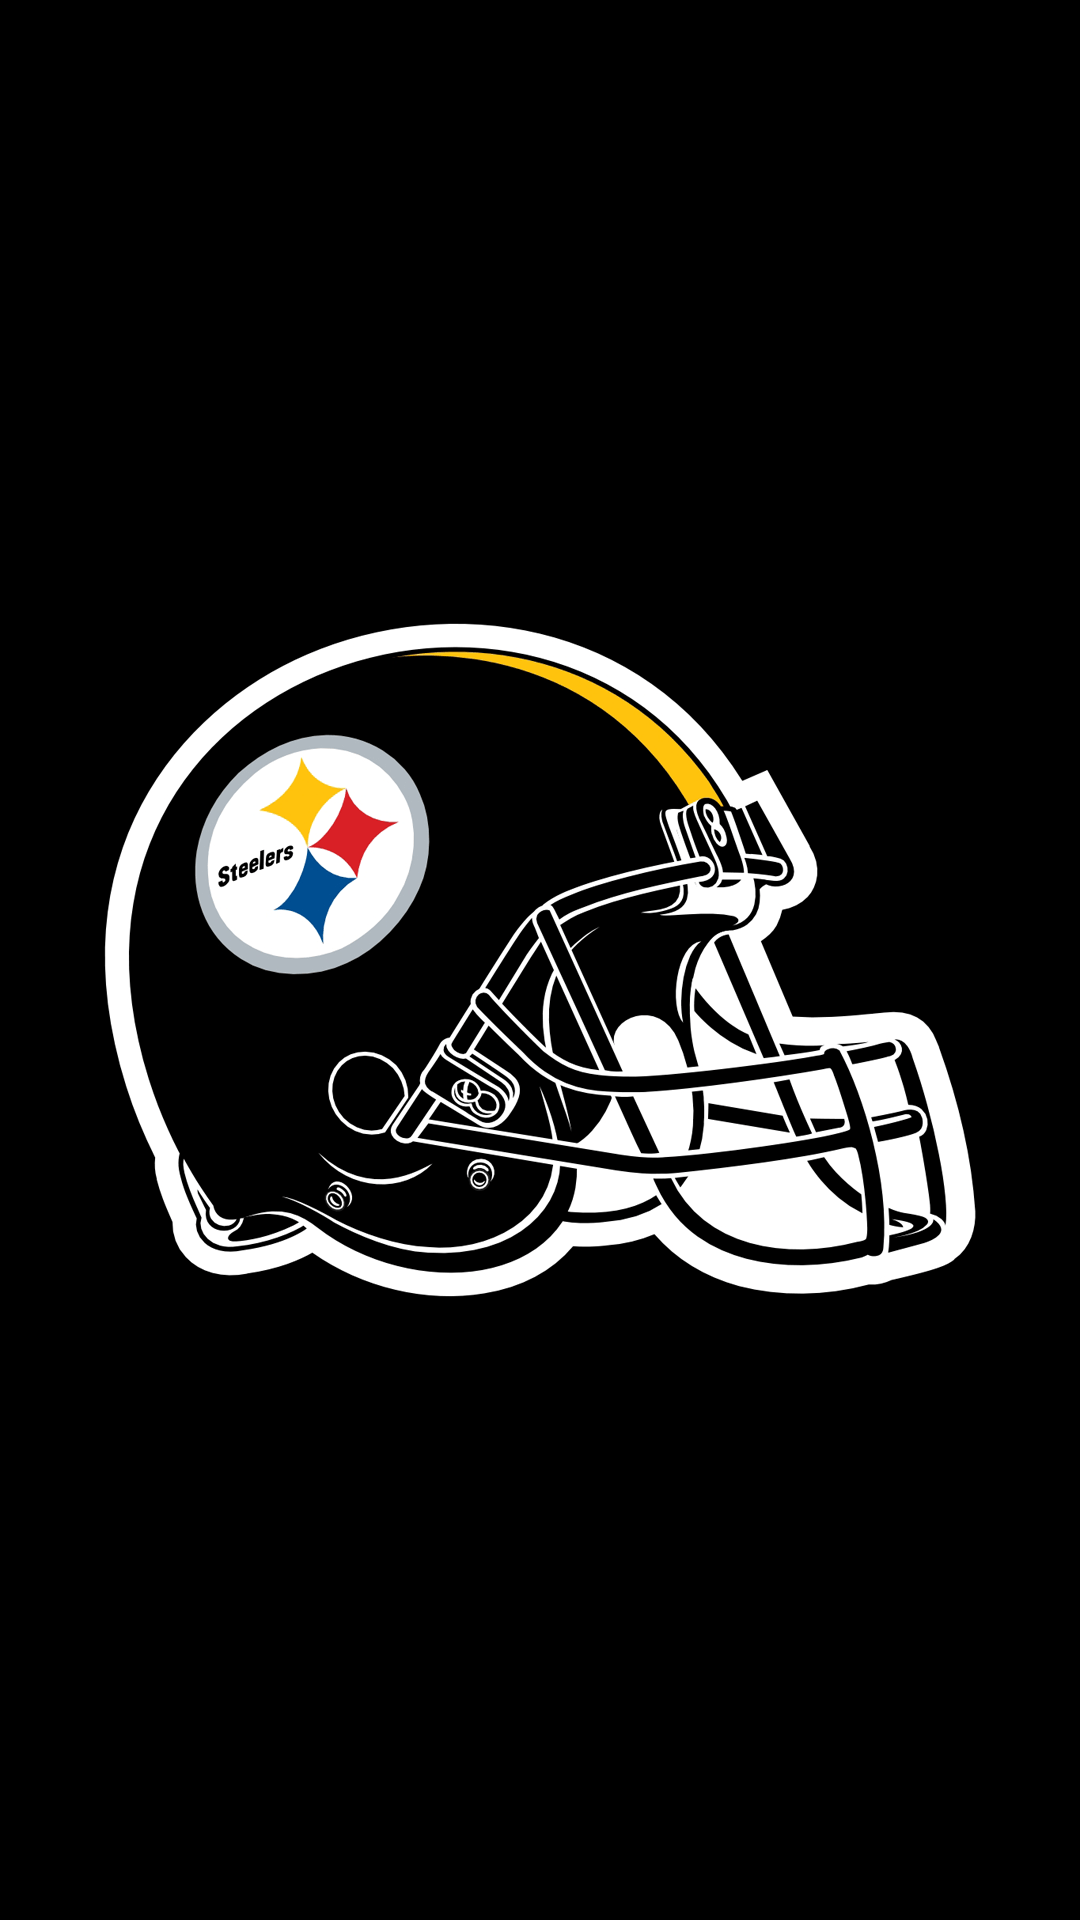 Steelers Wallpapers 2017 Wallpaper Cave